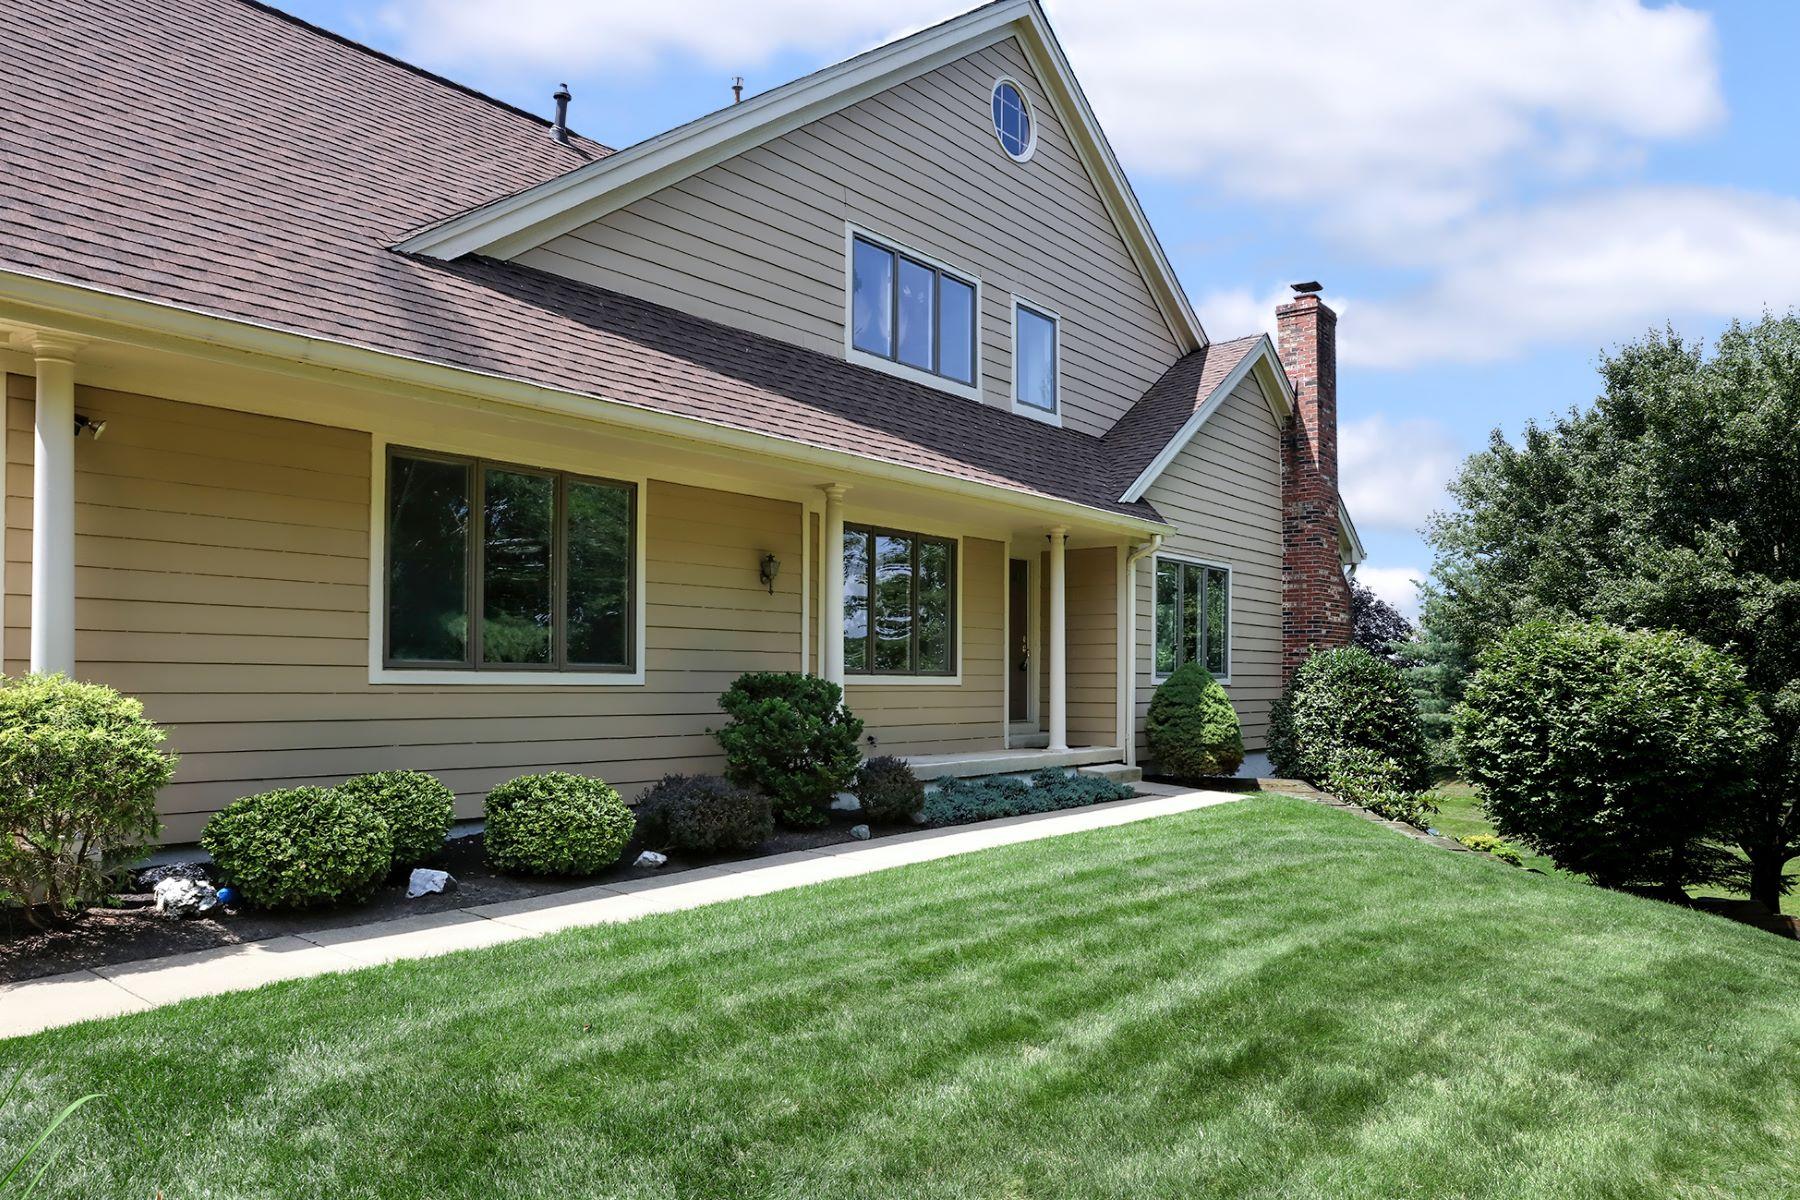 Townhouse for Sale at A Prime Location In Woodcrest 6 Sturbridge Court Lambertville, New Jersey, 08530 United StatesIn/Around: Lambertville